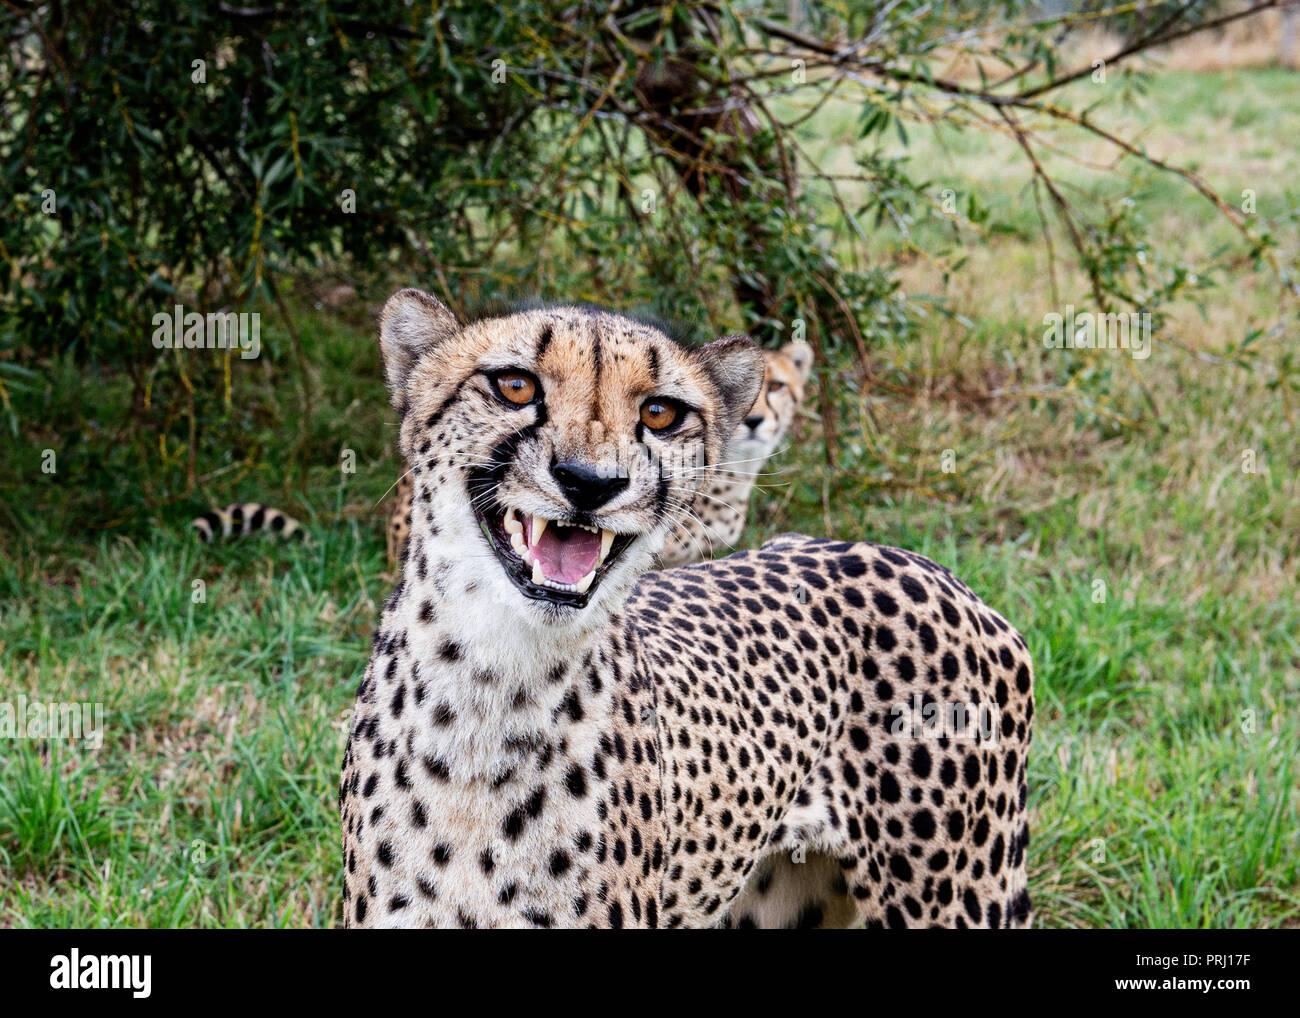 UK, Hamerton Zoo - 17 Aug 2018: cheetah, could be laughing, smiling or snarling - Stock Image